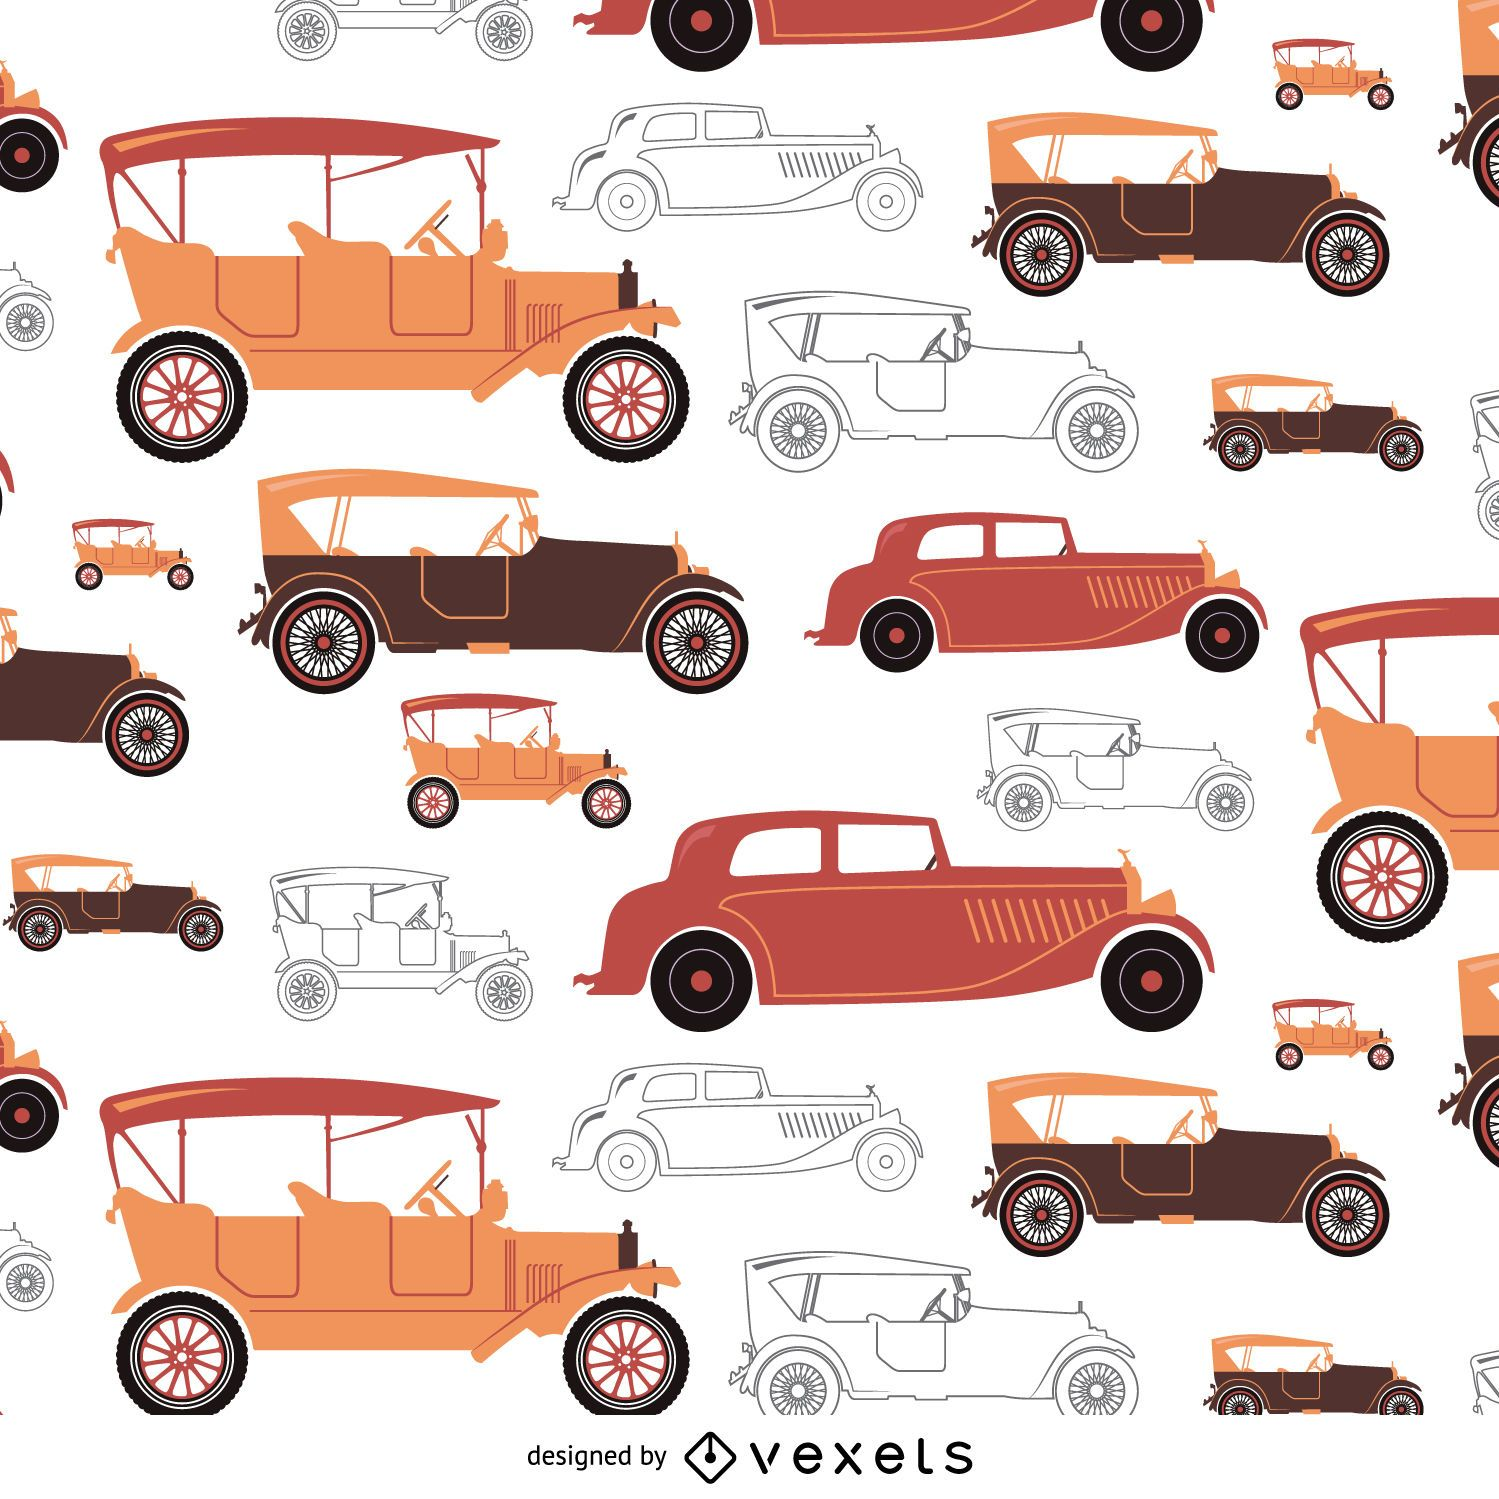 Vintage car tileable in warm tones